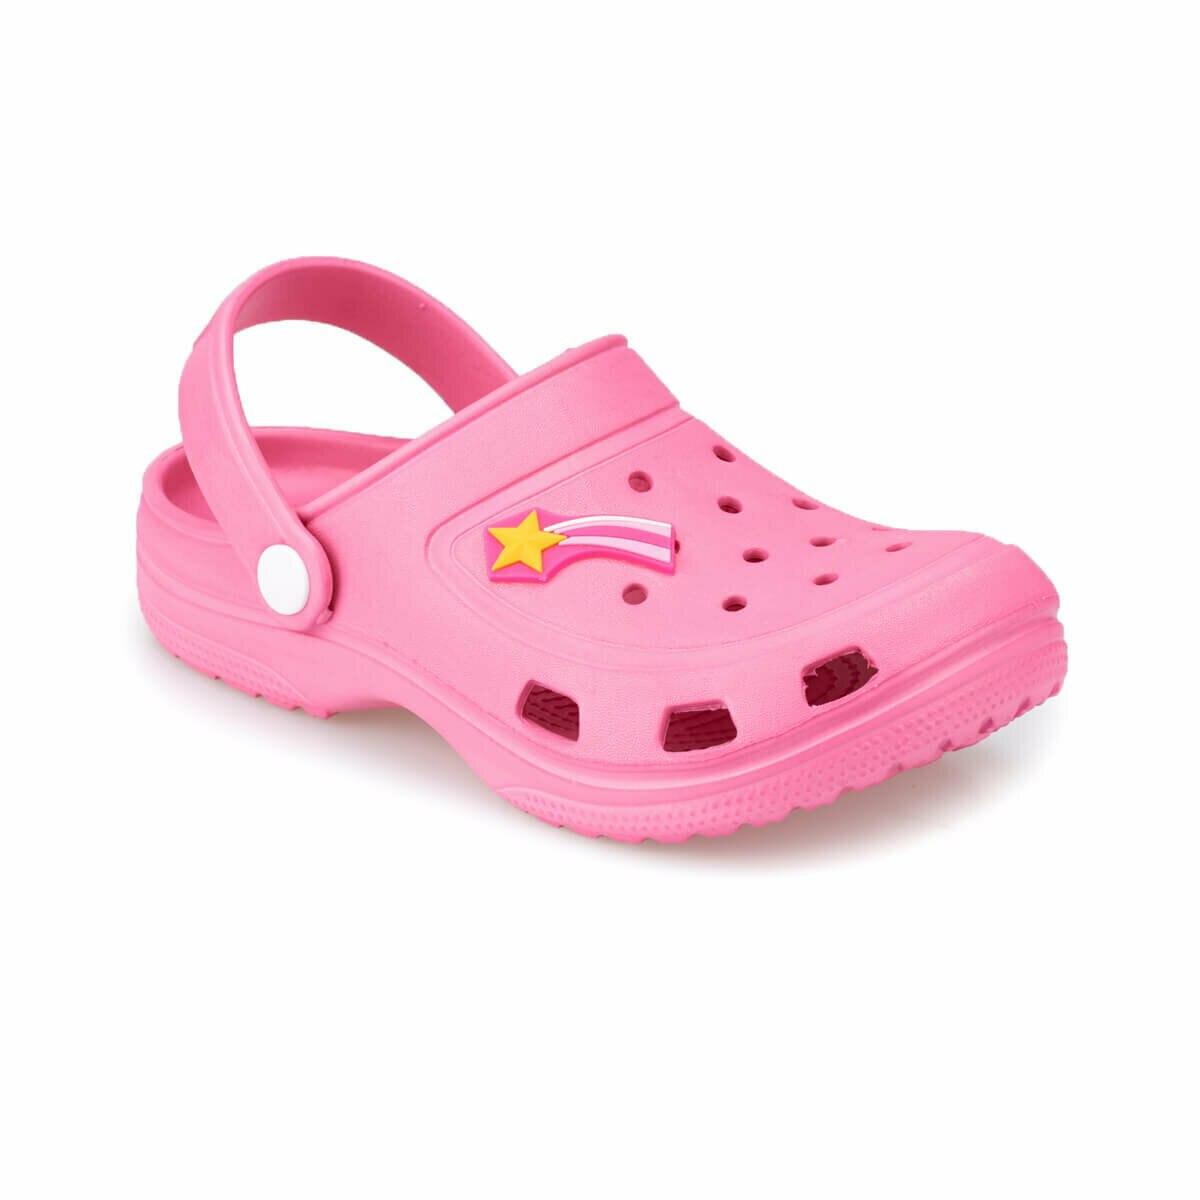 FLO FROG Pink Female Child Slippers KINETIX